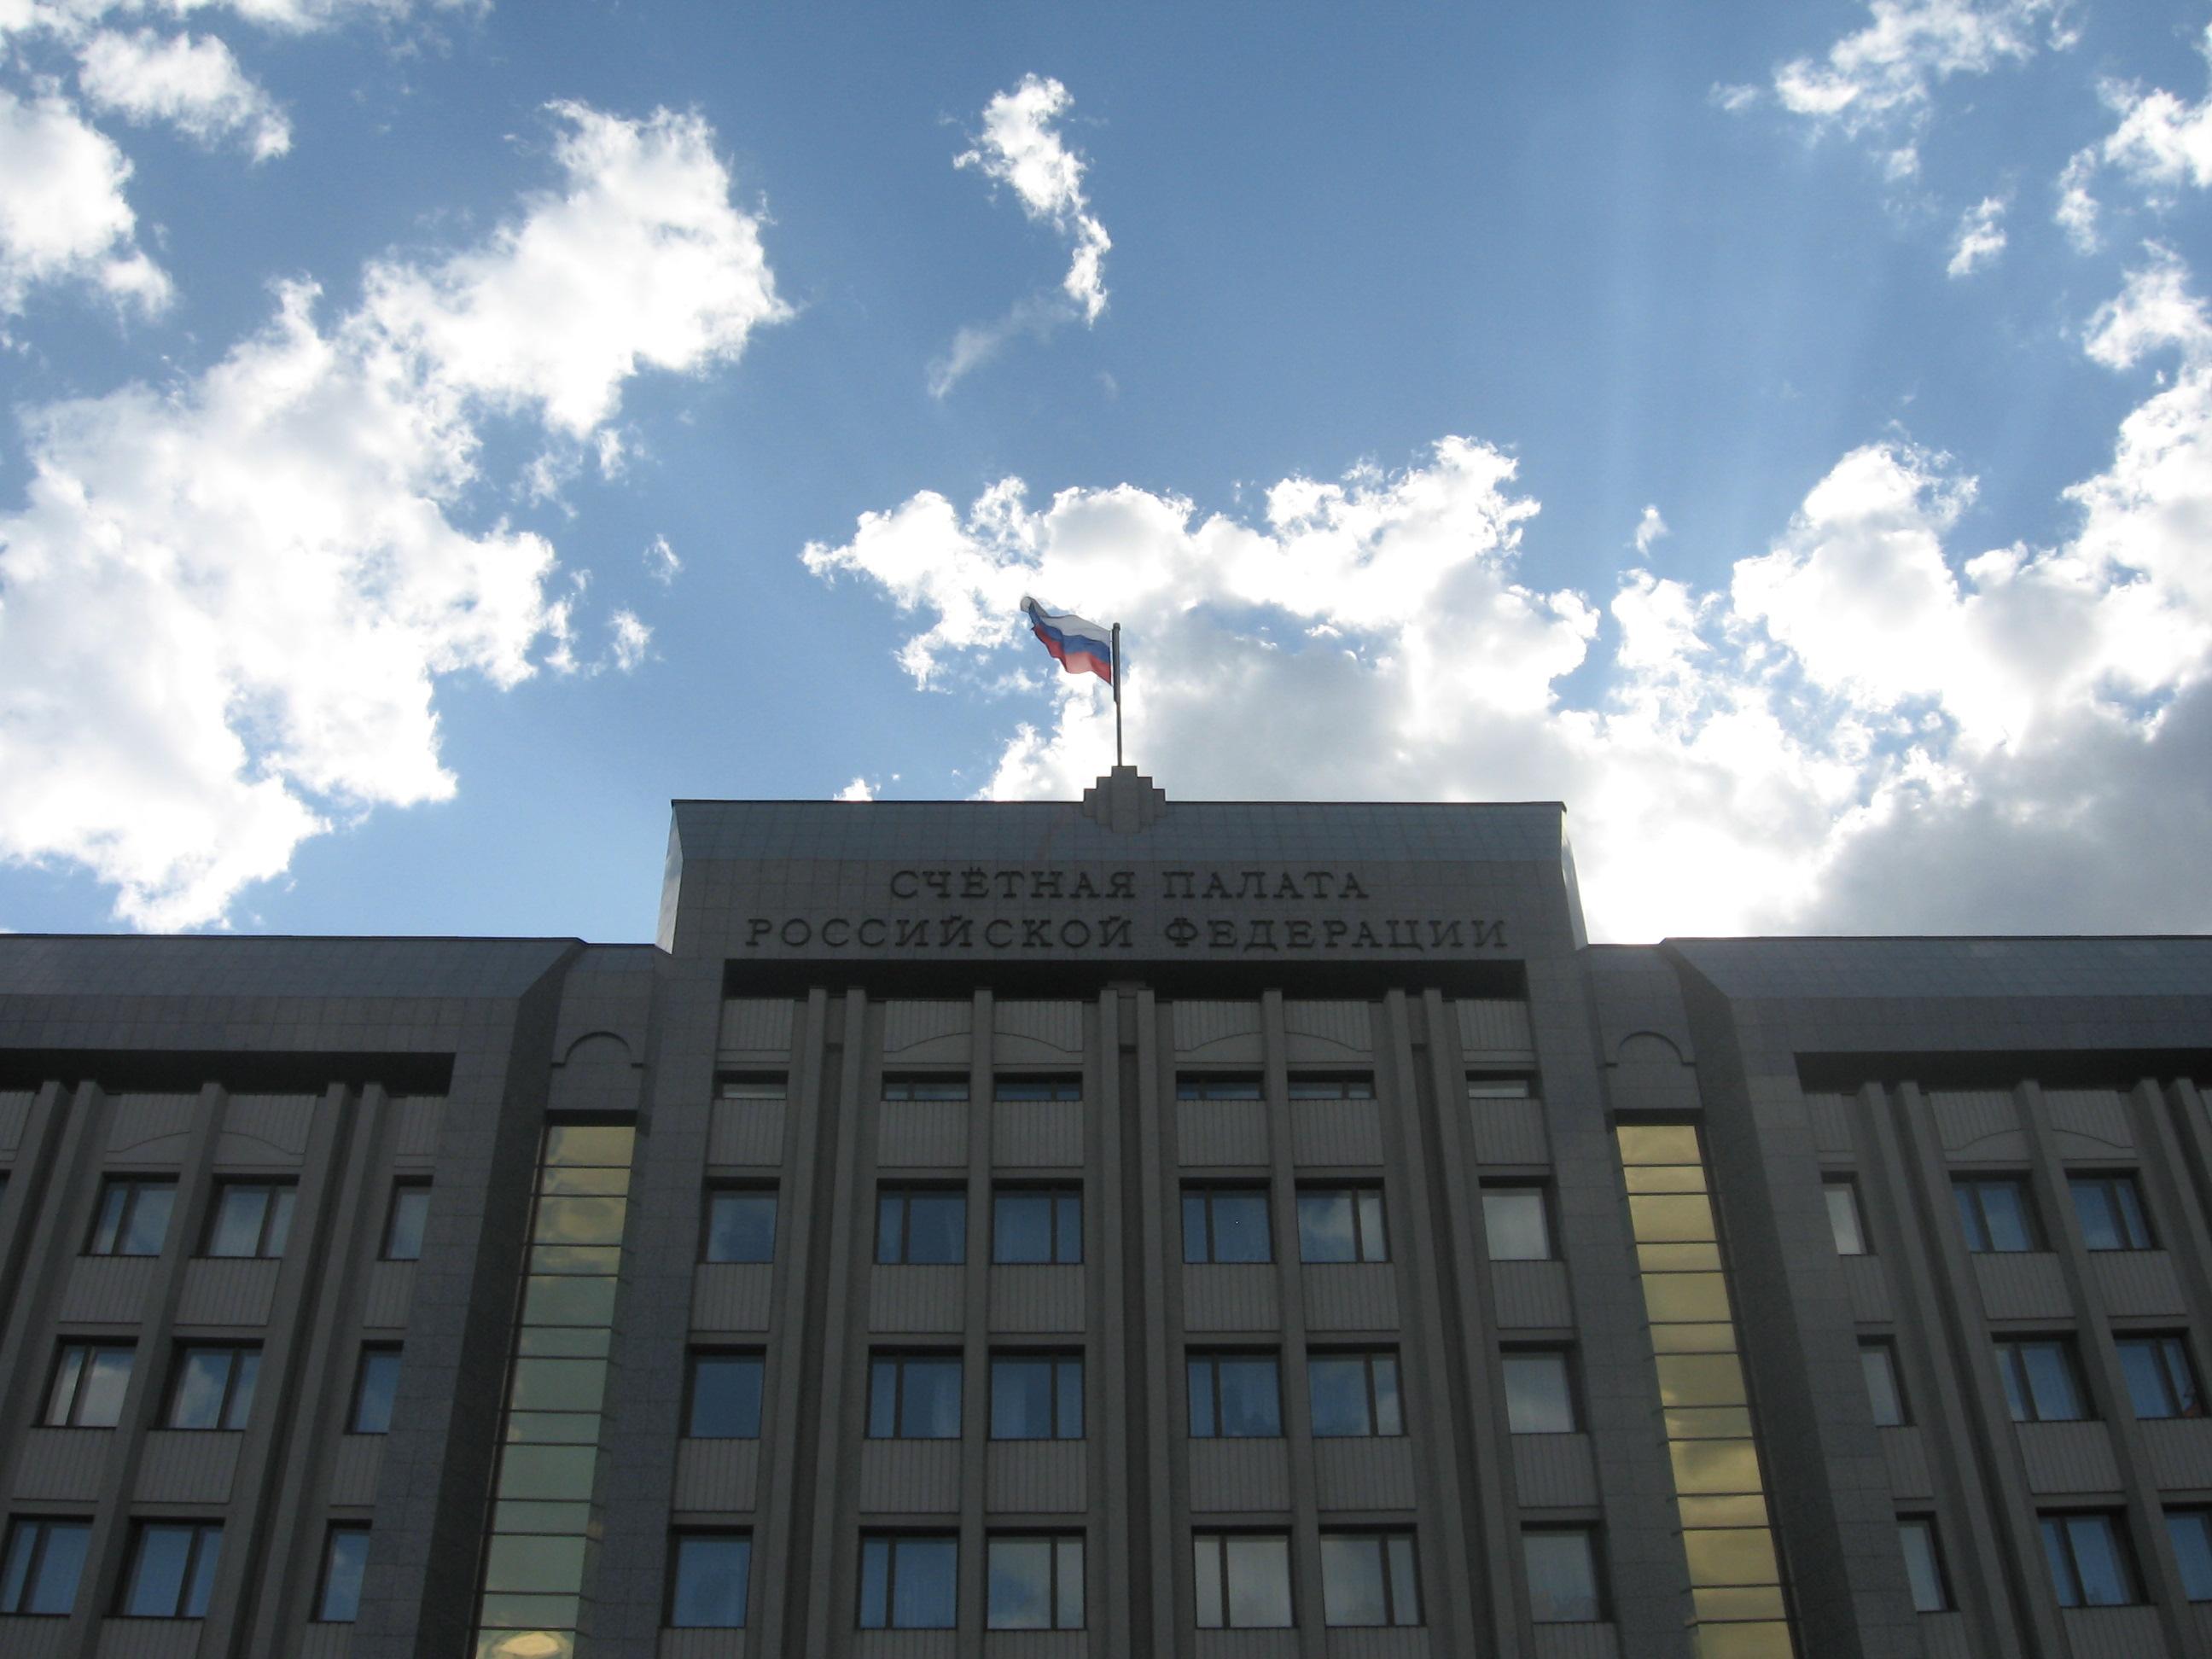 http://upload.wikimedia.org/wikipedia/commons/9/93/Вид_на_Здание_Счётной_палаты.jpg